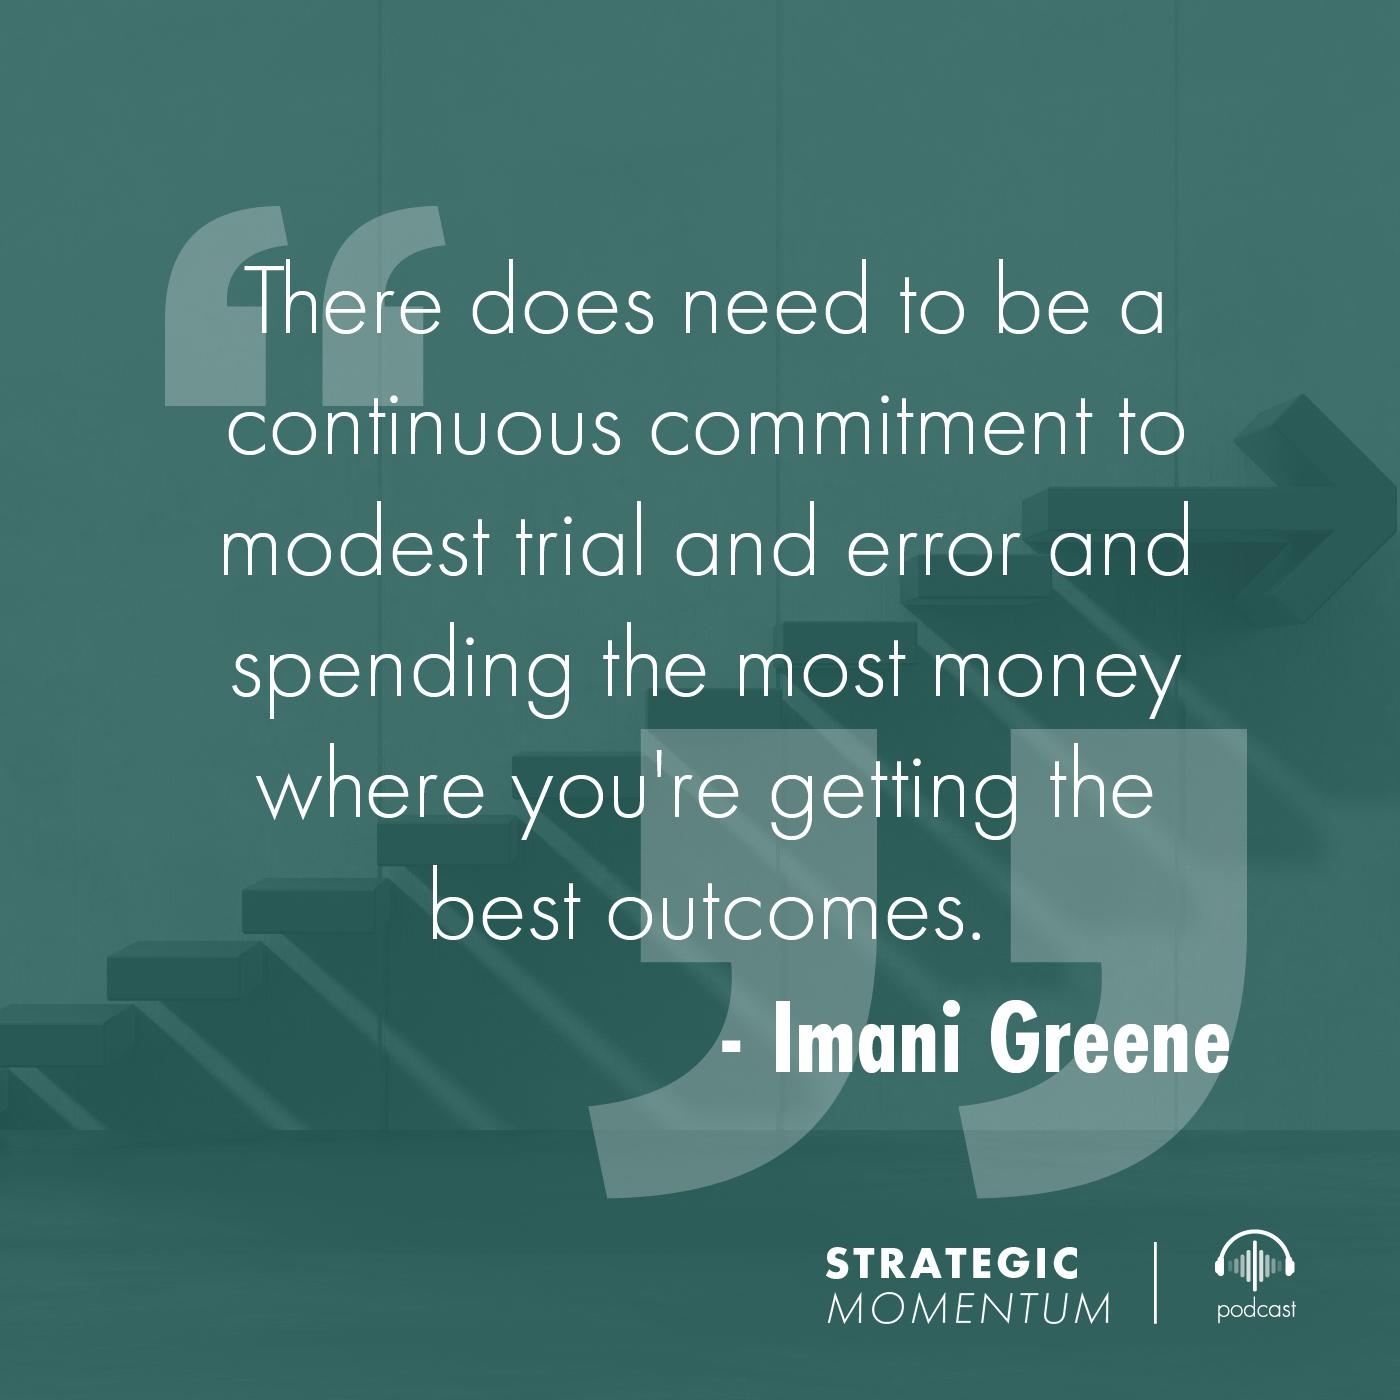 Imani Greene Quote | Strategic Momentum Podcast